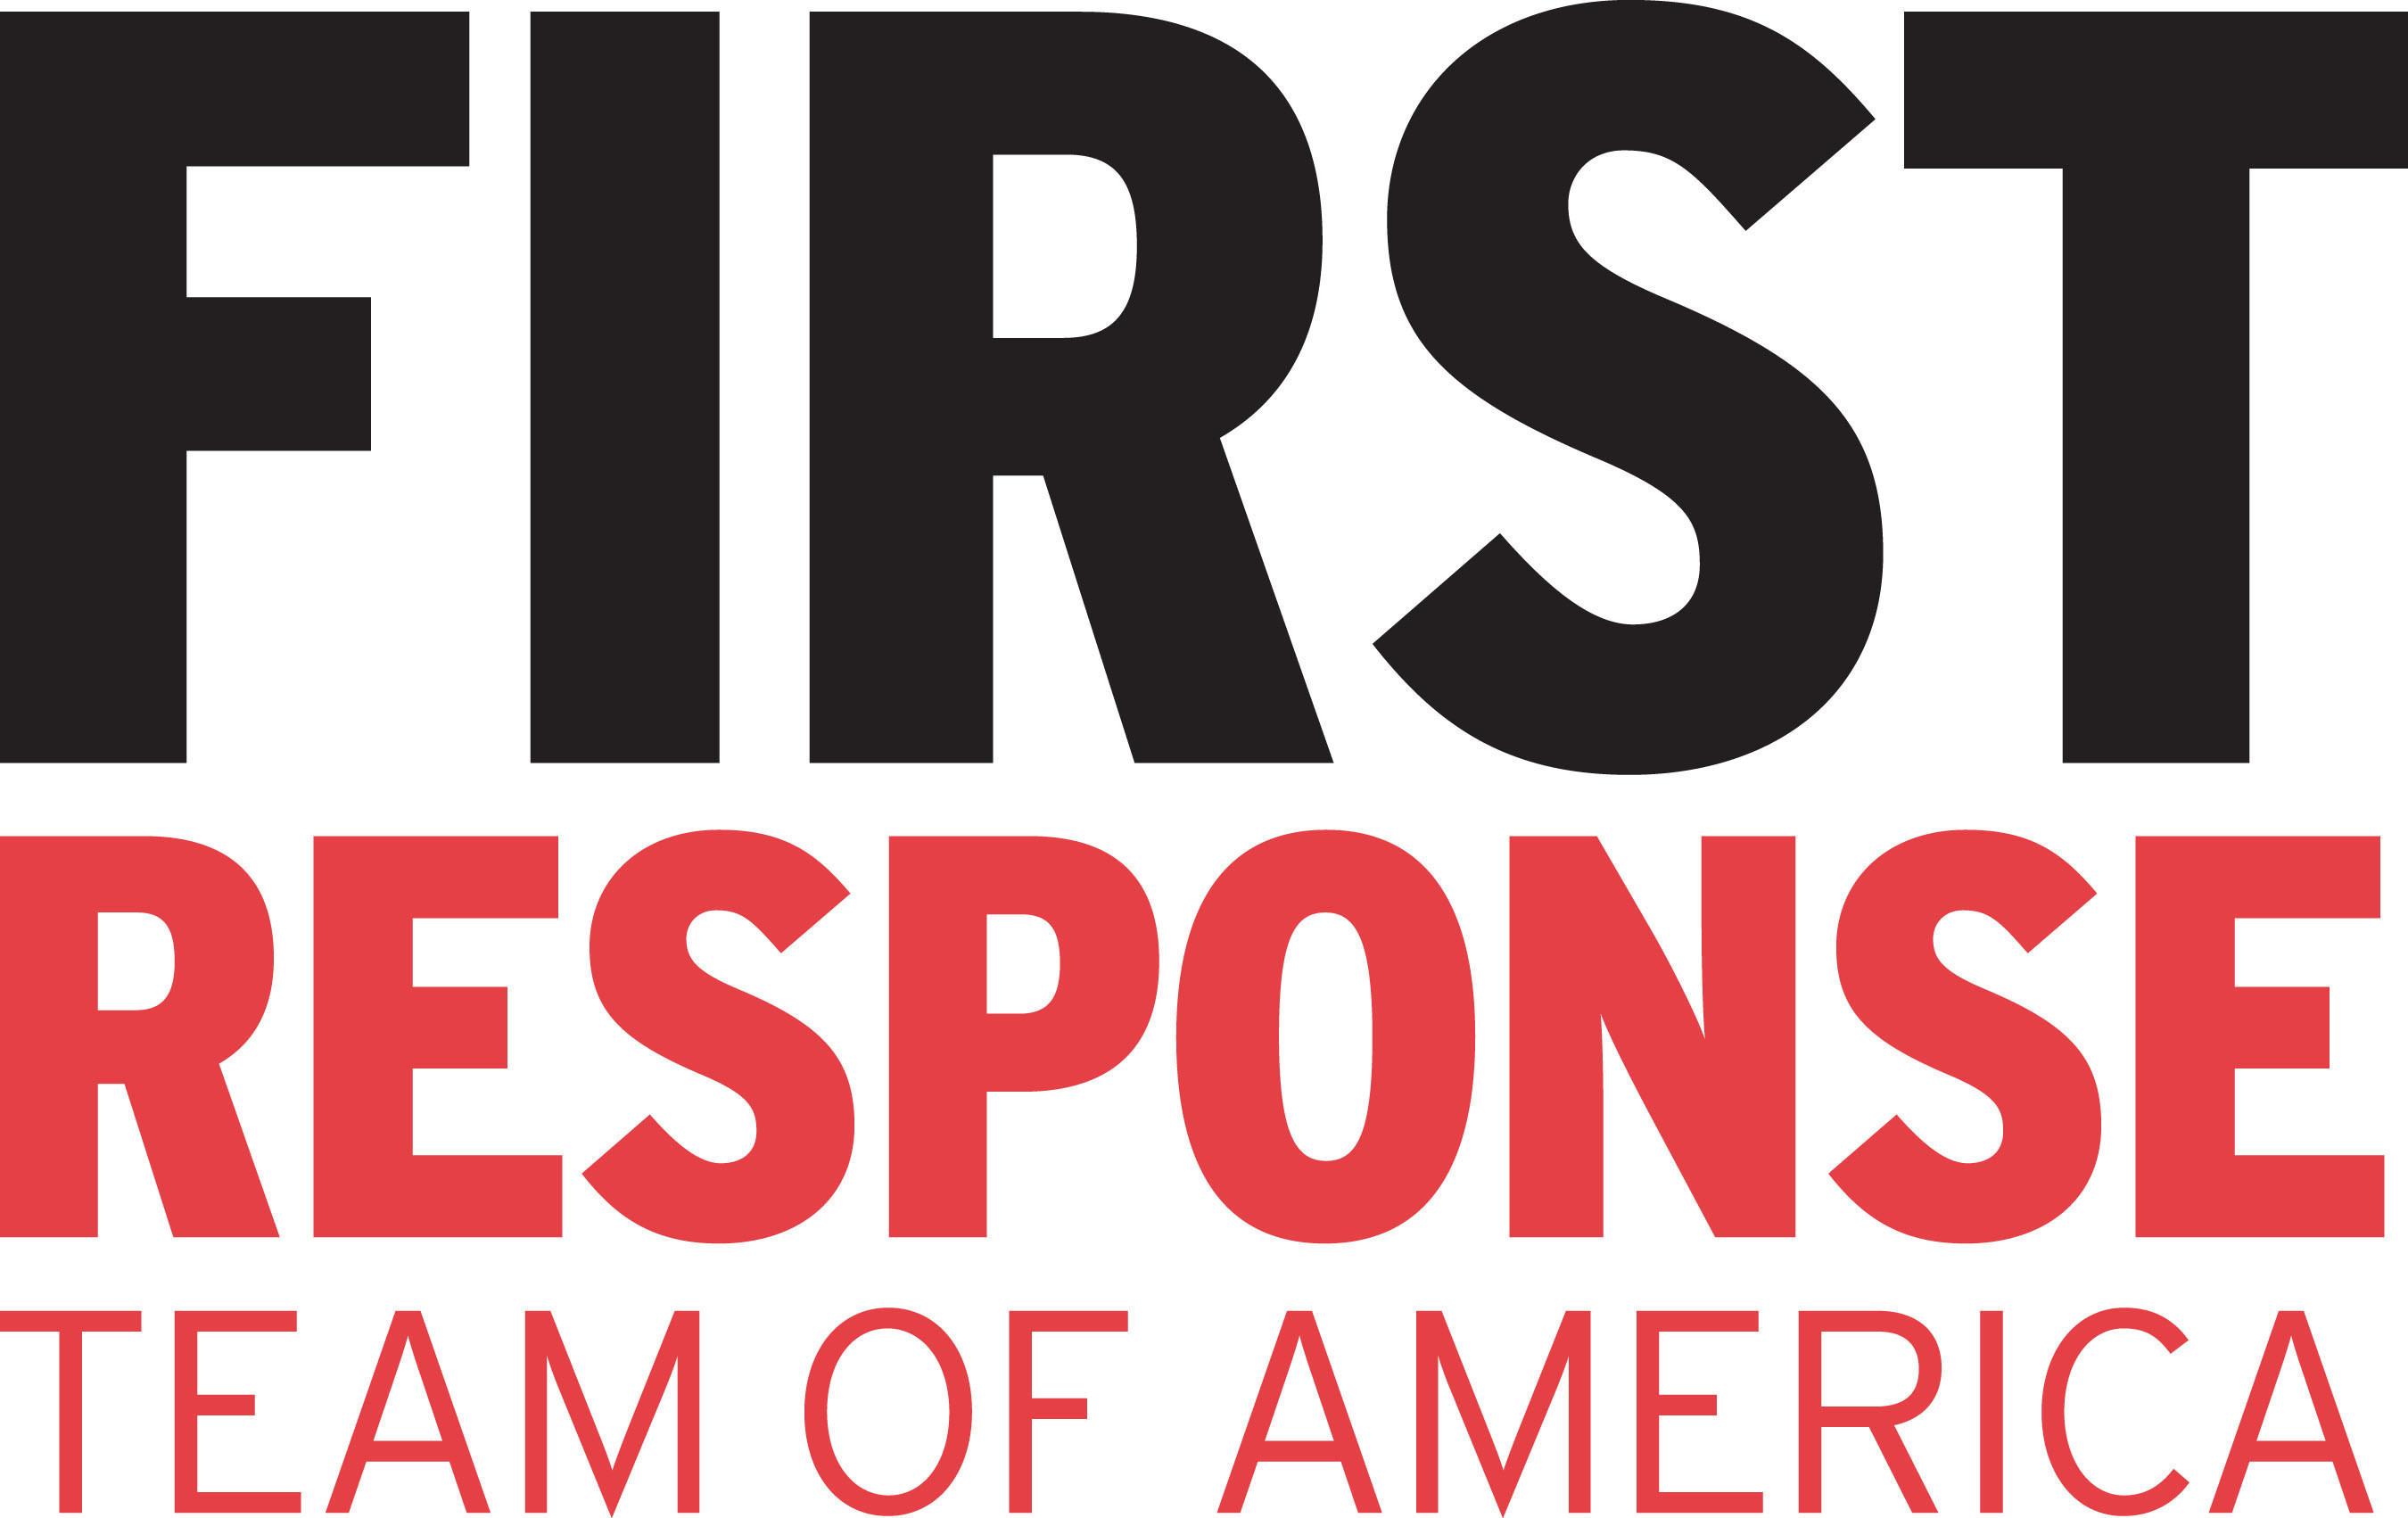 First Response Team of America logo